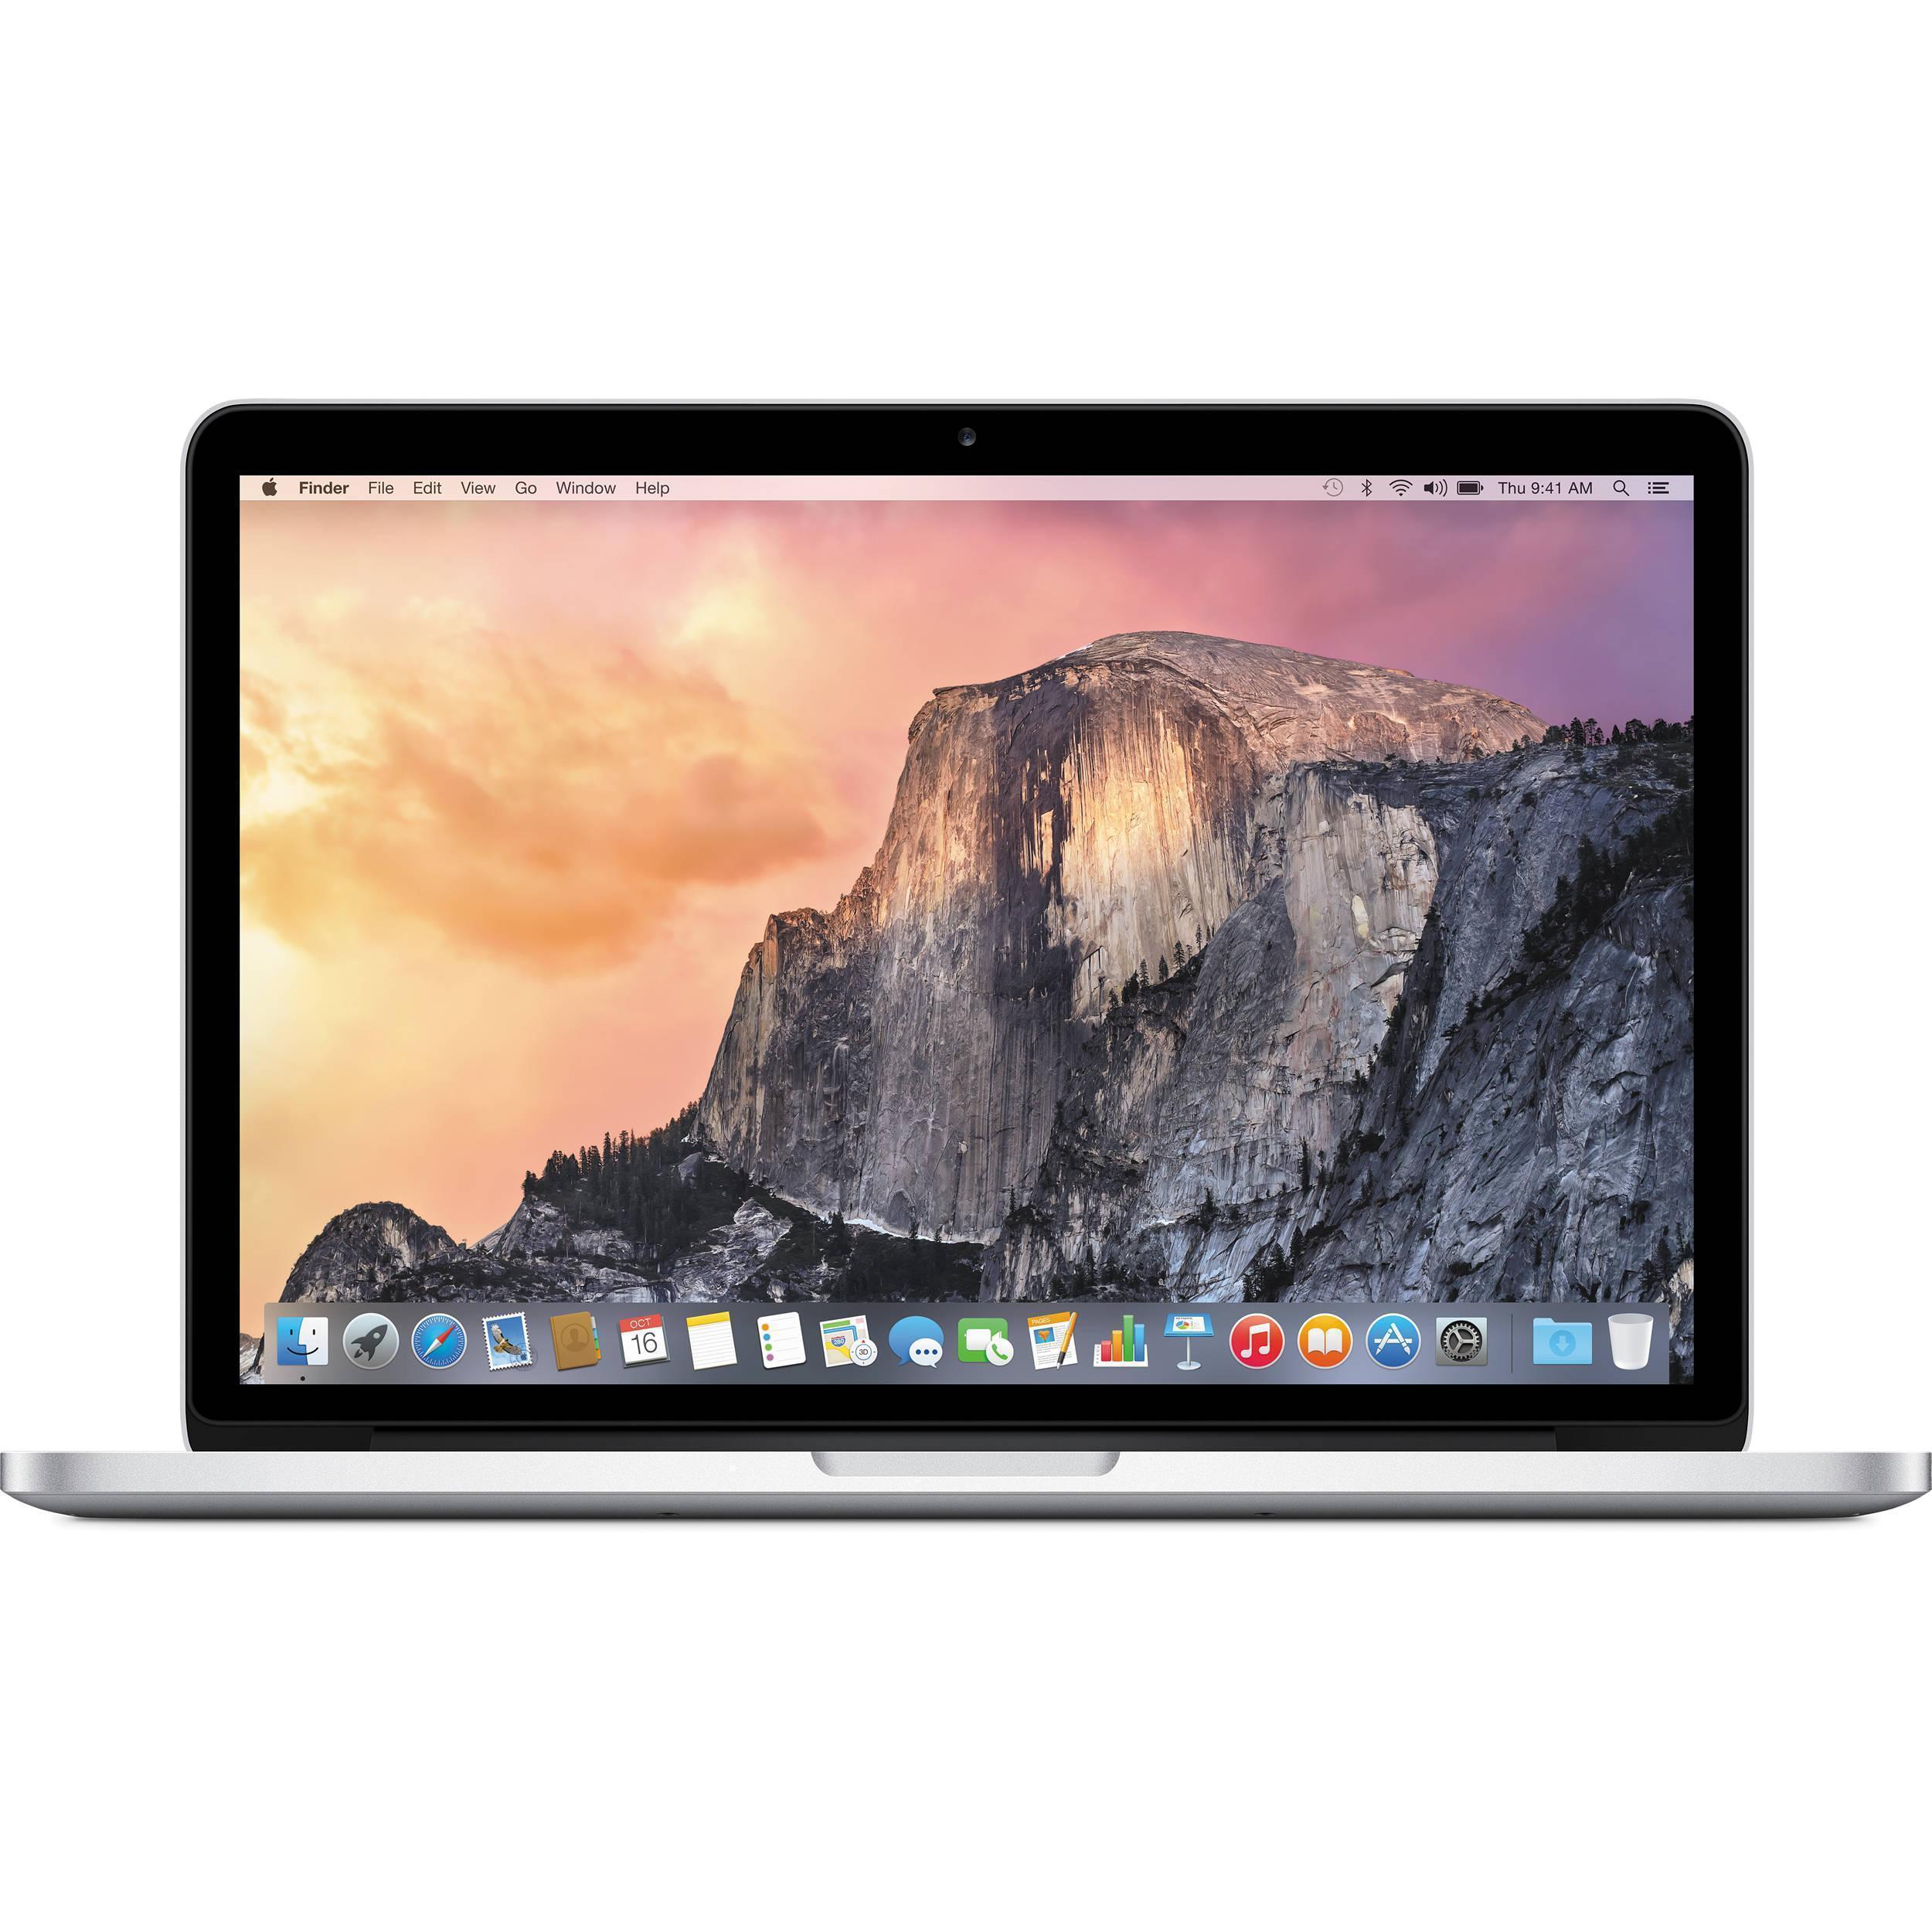 "MacBook Pro 13"" Retina (2014) - Core i5 2,6 GHz - SSD 256 GB - 16GB - Tastiera QWERTZ - Tedesco"